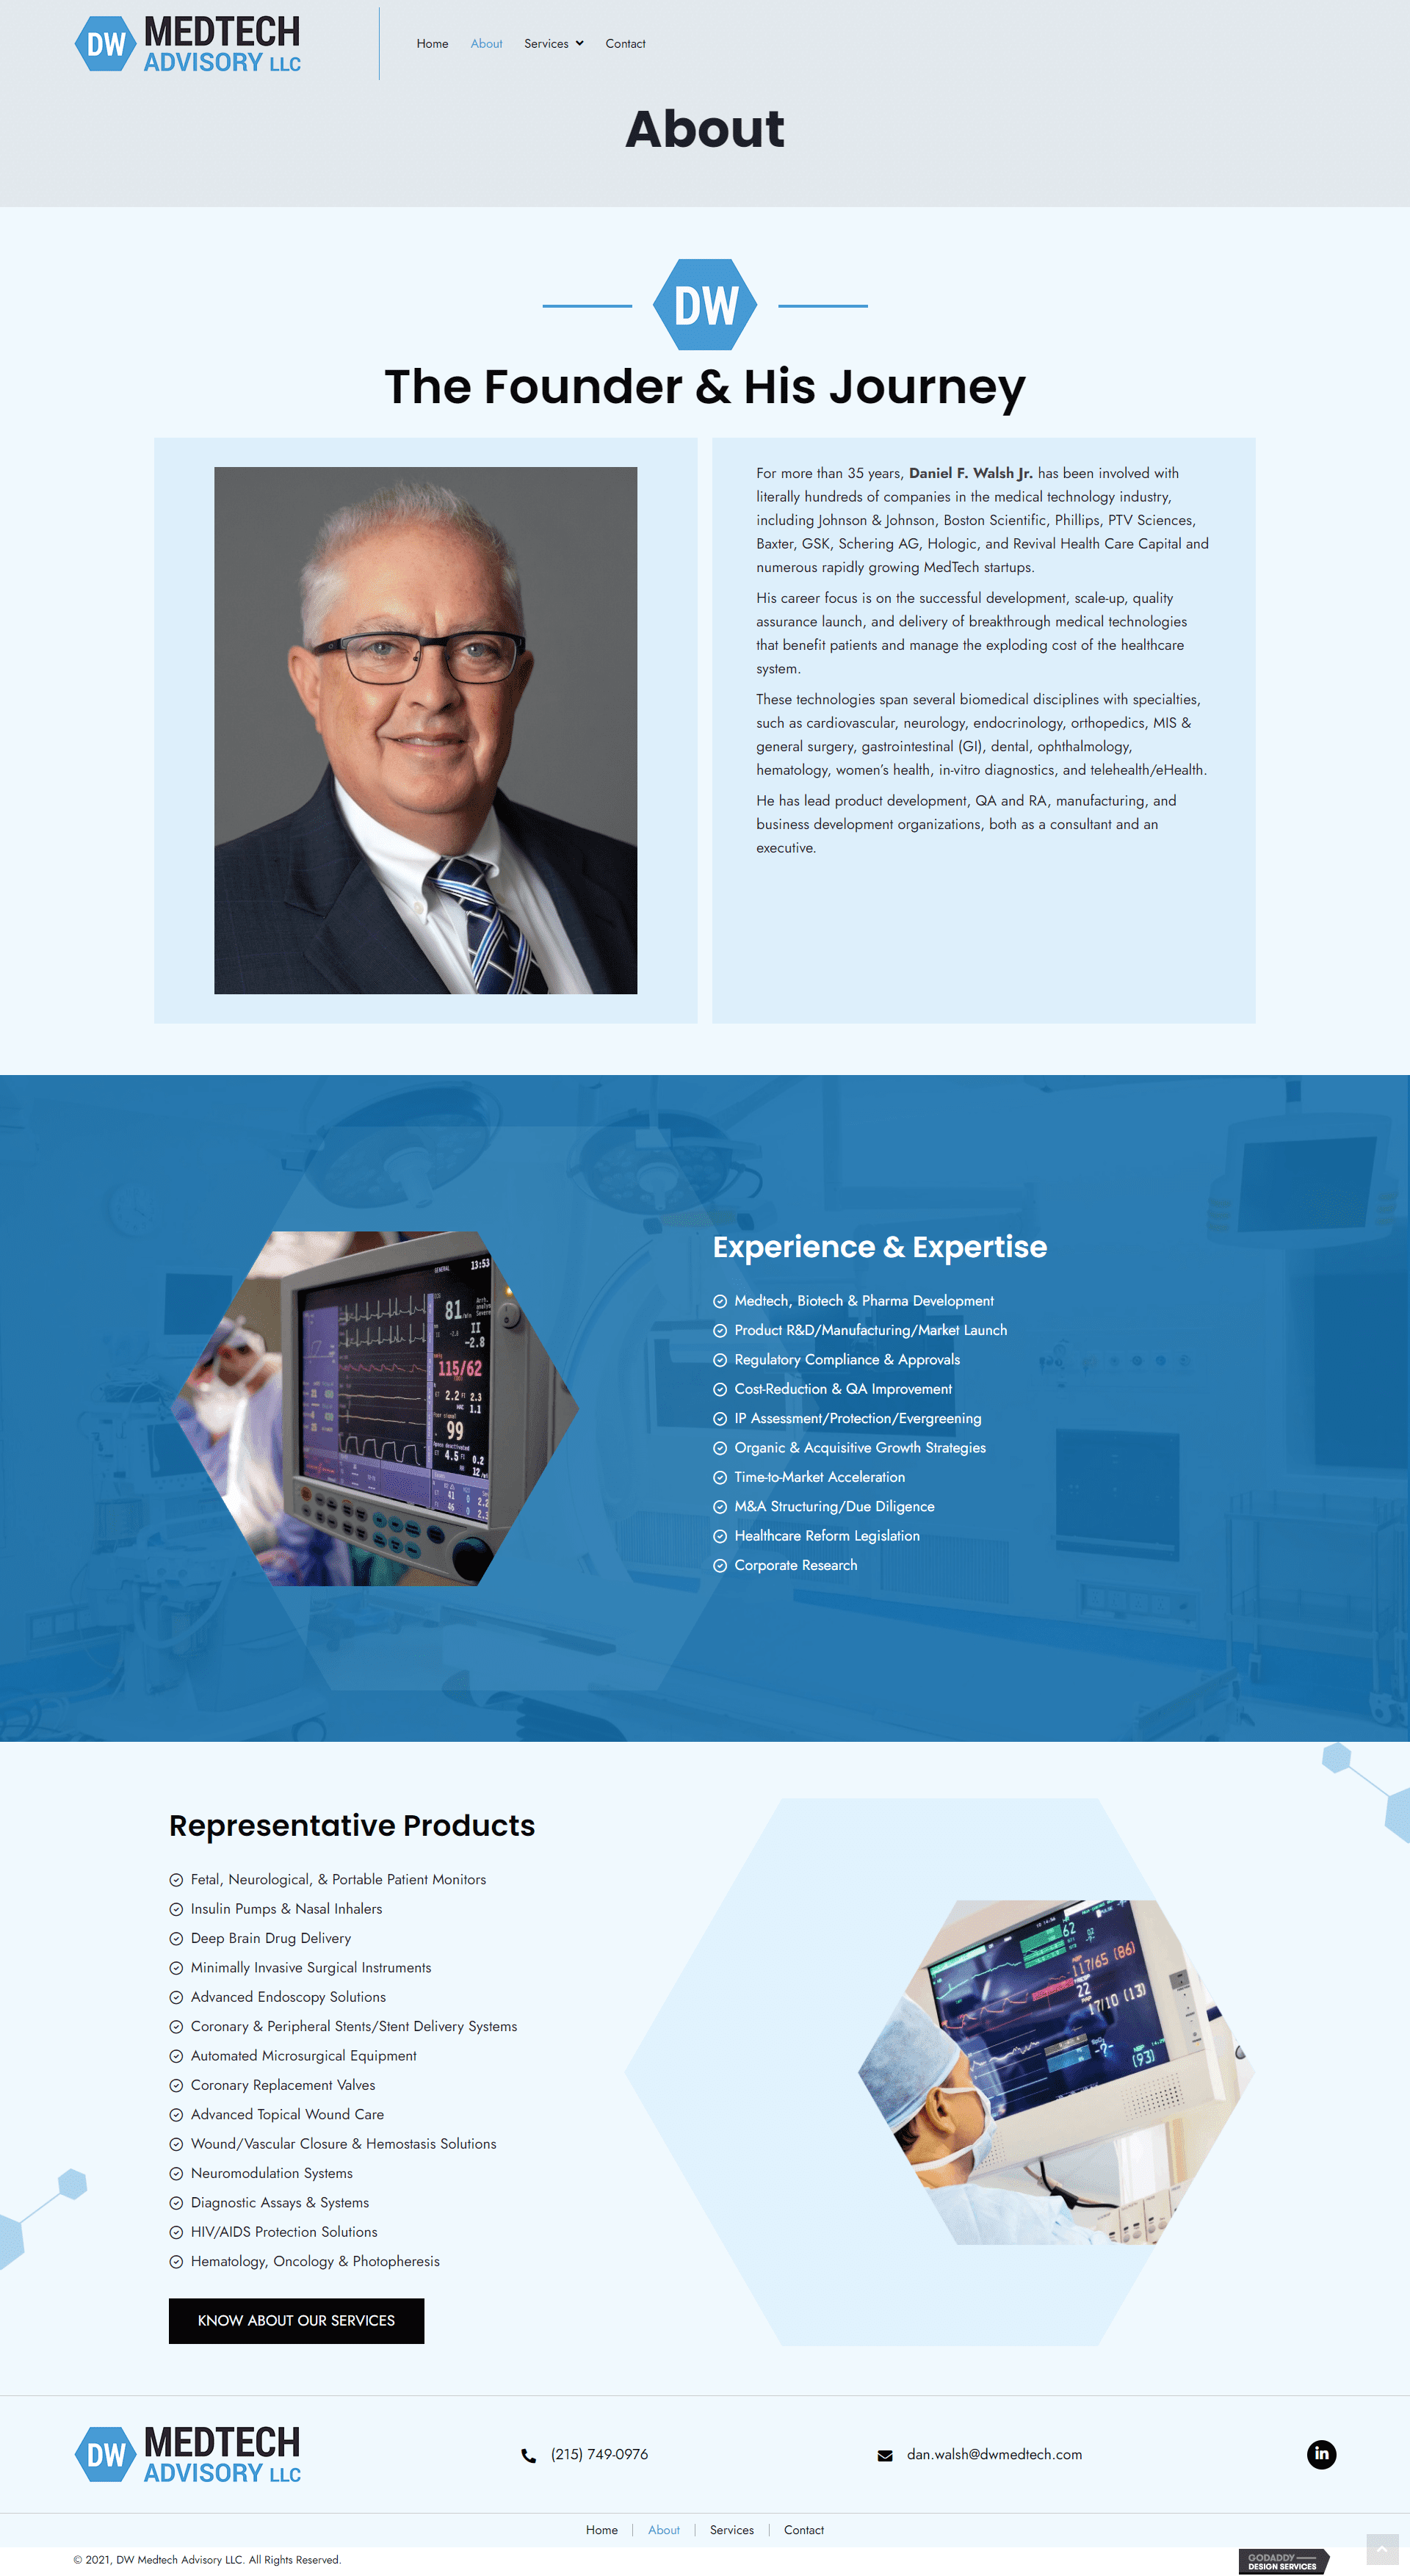 DW Medtech Advisory LLC About